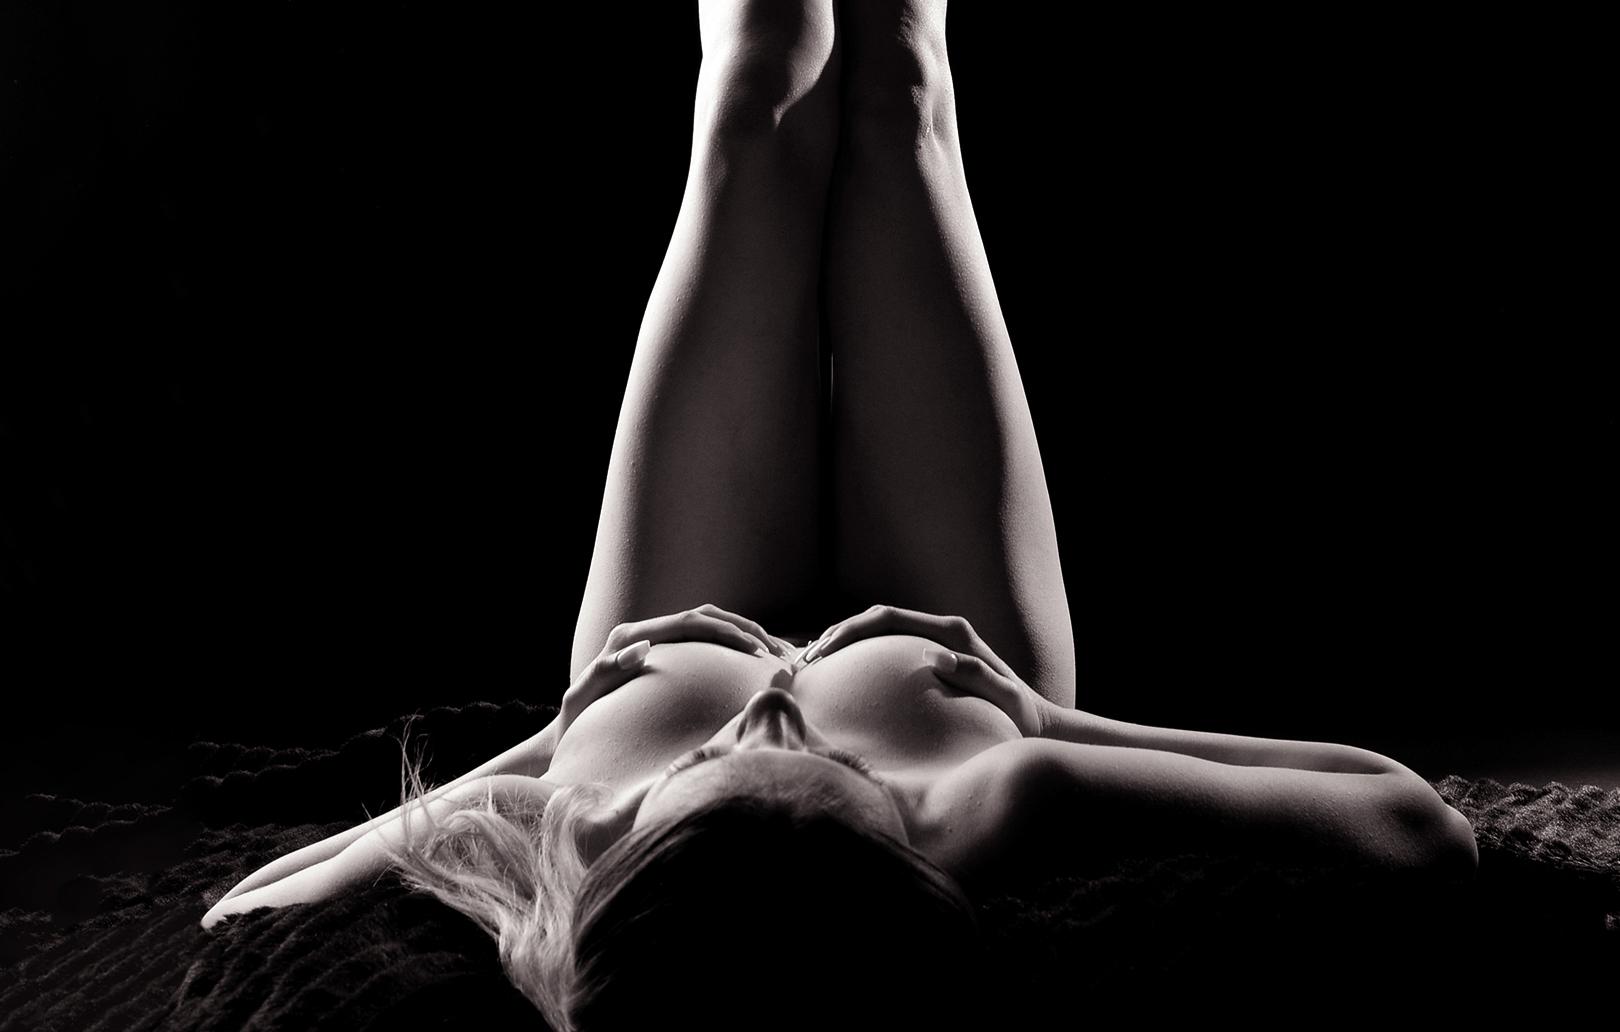 erotisches-fotoshooting-kaiserslautern-bg41610461814